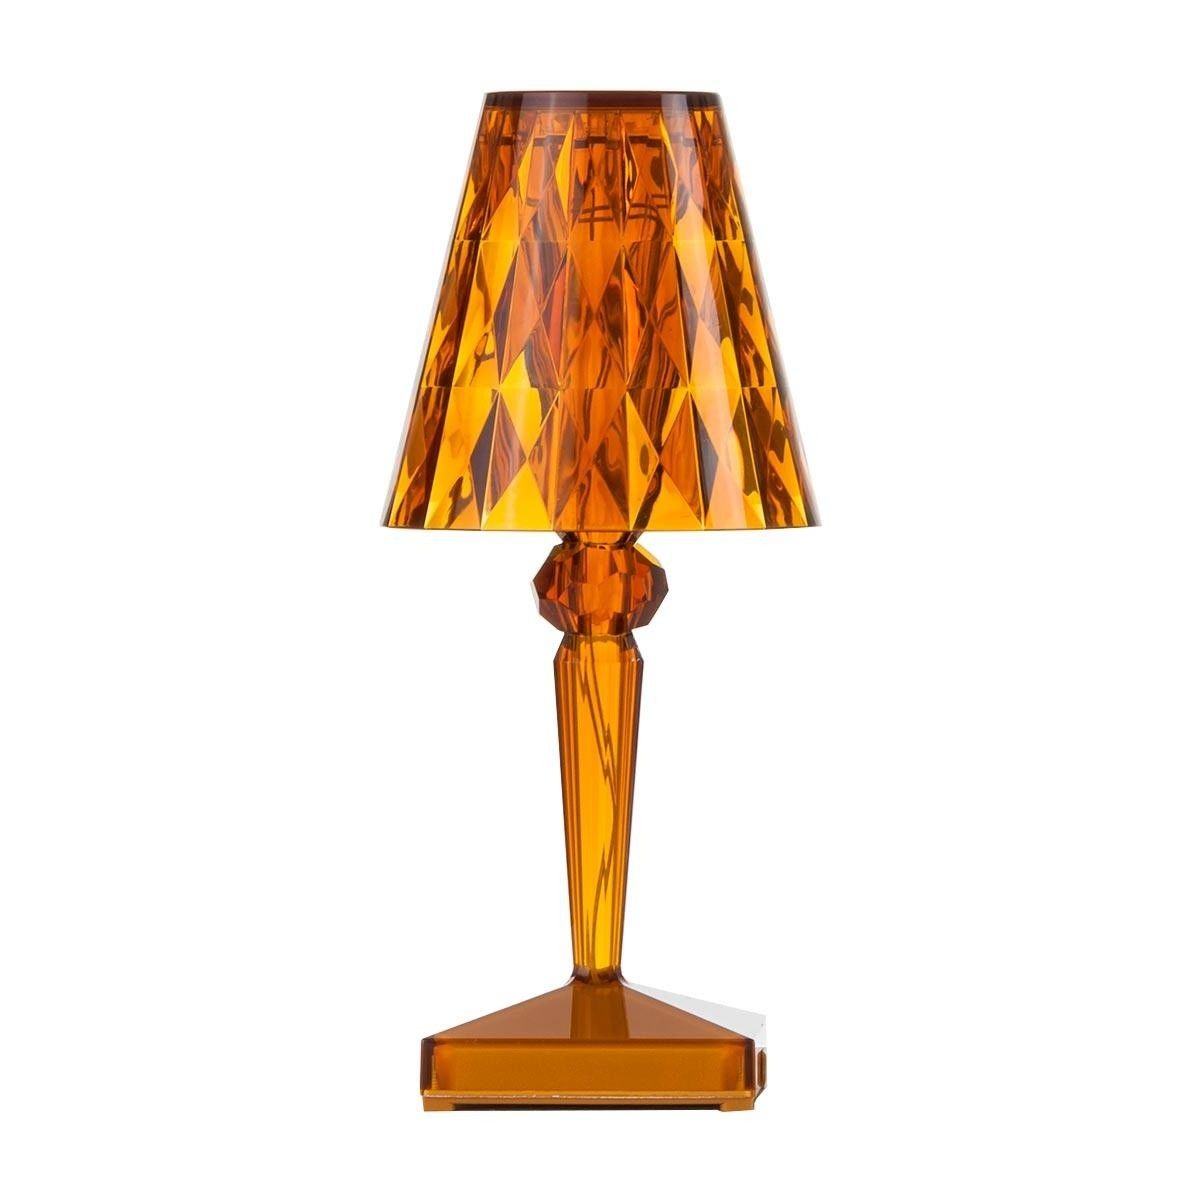 Battery led lampe de table sans fil kartell for Lampe de table jaune